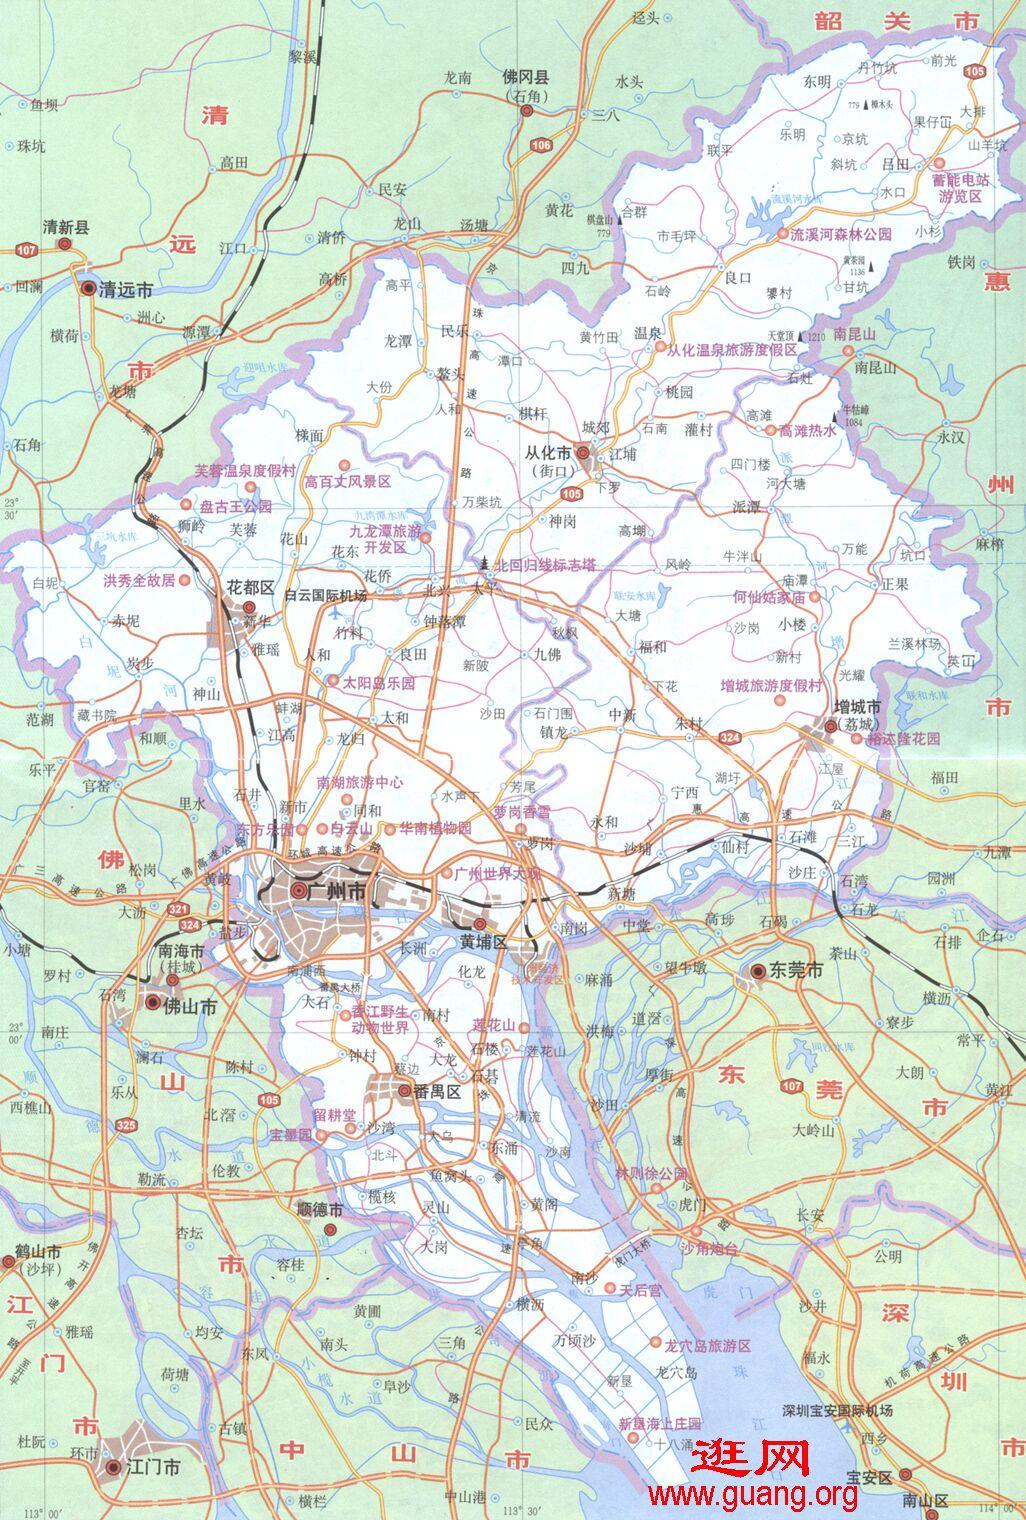 Guangzhou 2广州地图市区地图全图 点滴之间 聚沙成金